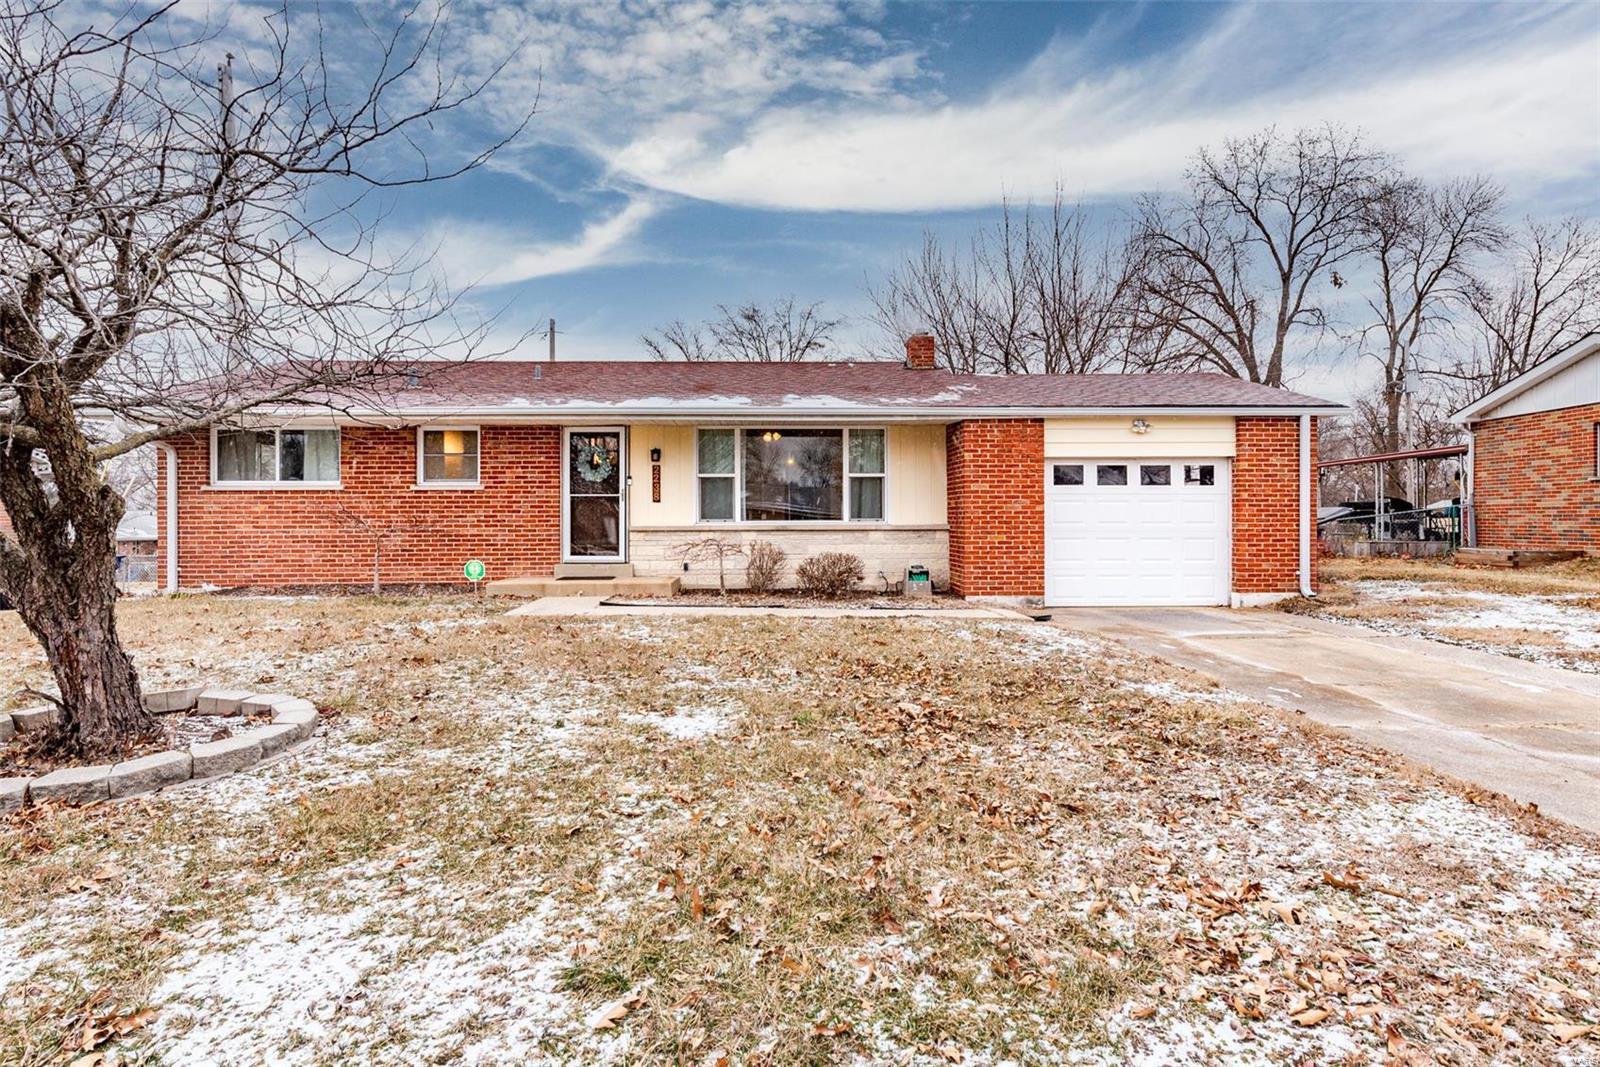 2238 N Warson Property Photo - St Louis, MO real estate listing